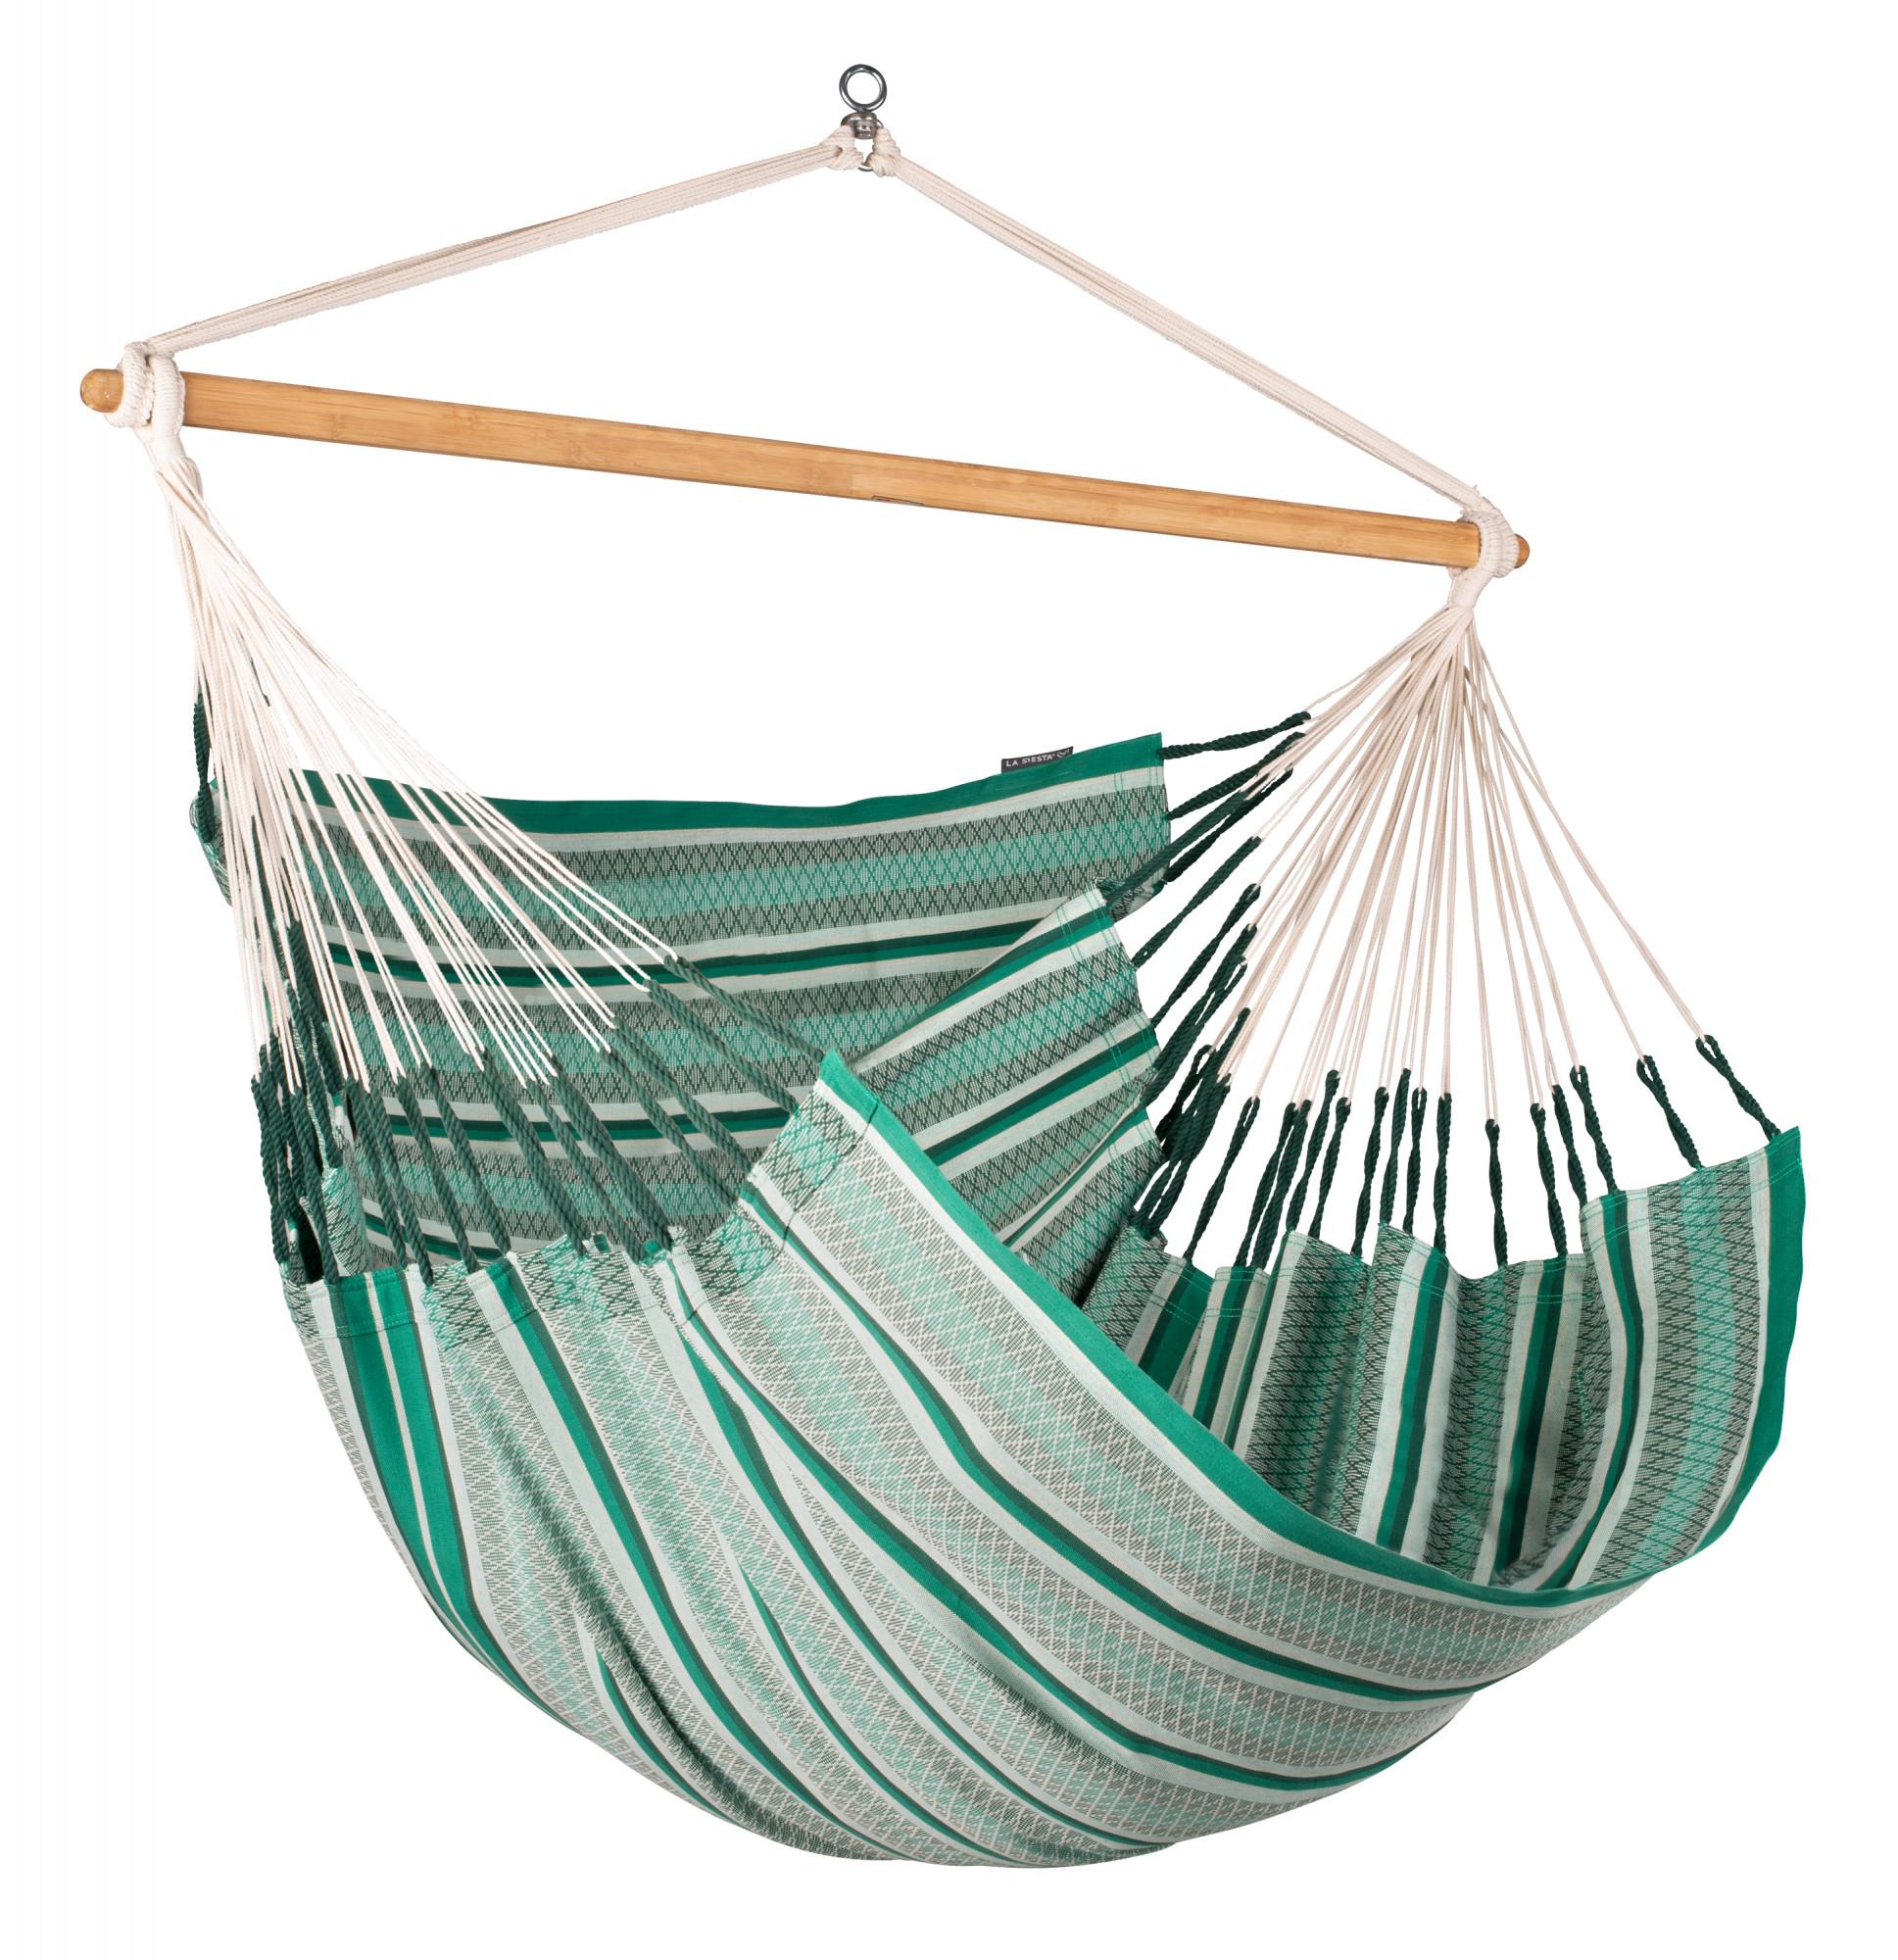 Chaise-hamac kingsize en coton bio vert